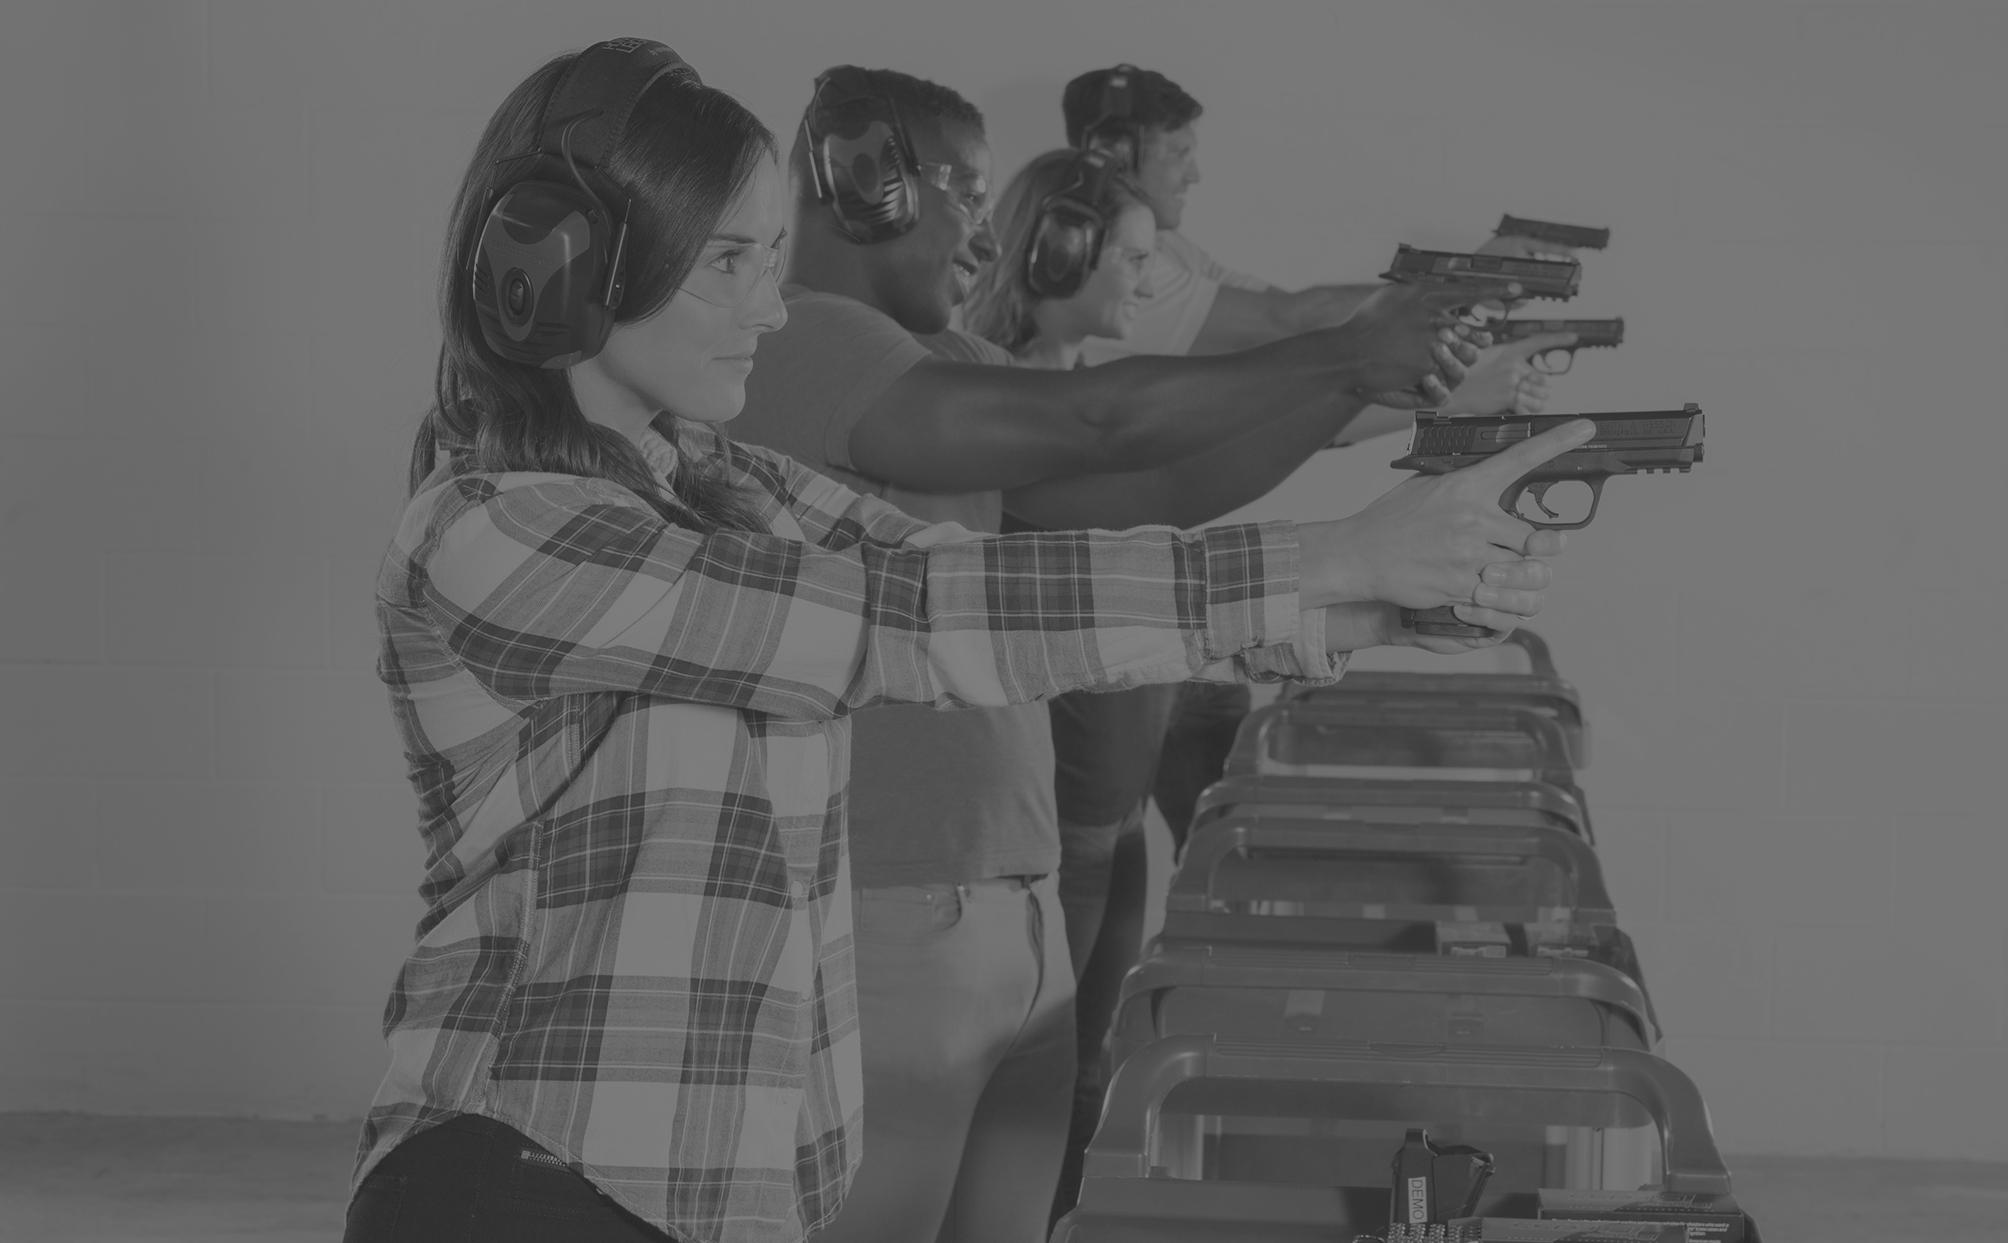 Classic Gun Range Group